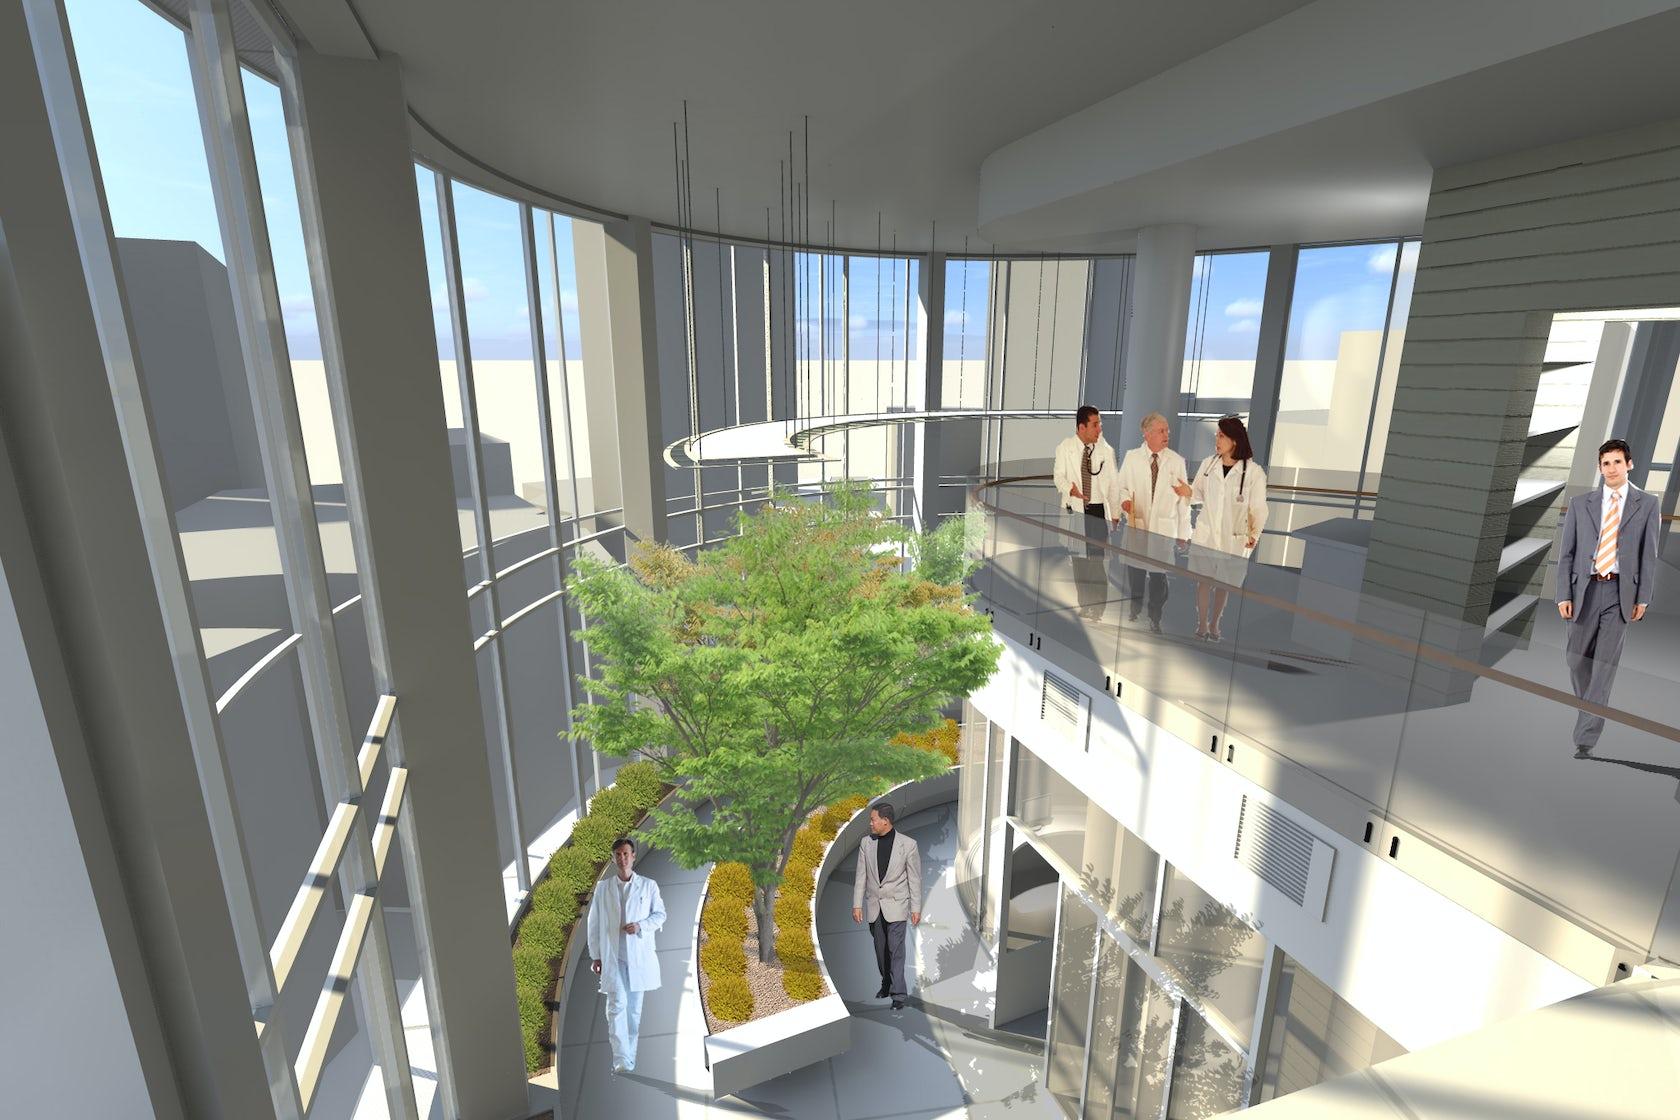 CUTR – Center for Urban Transportation Research ...